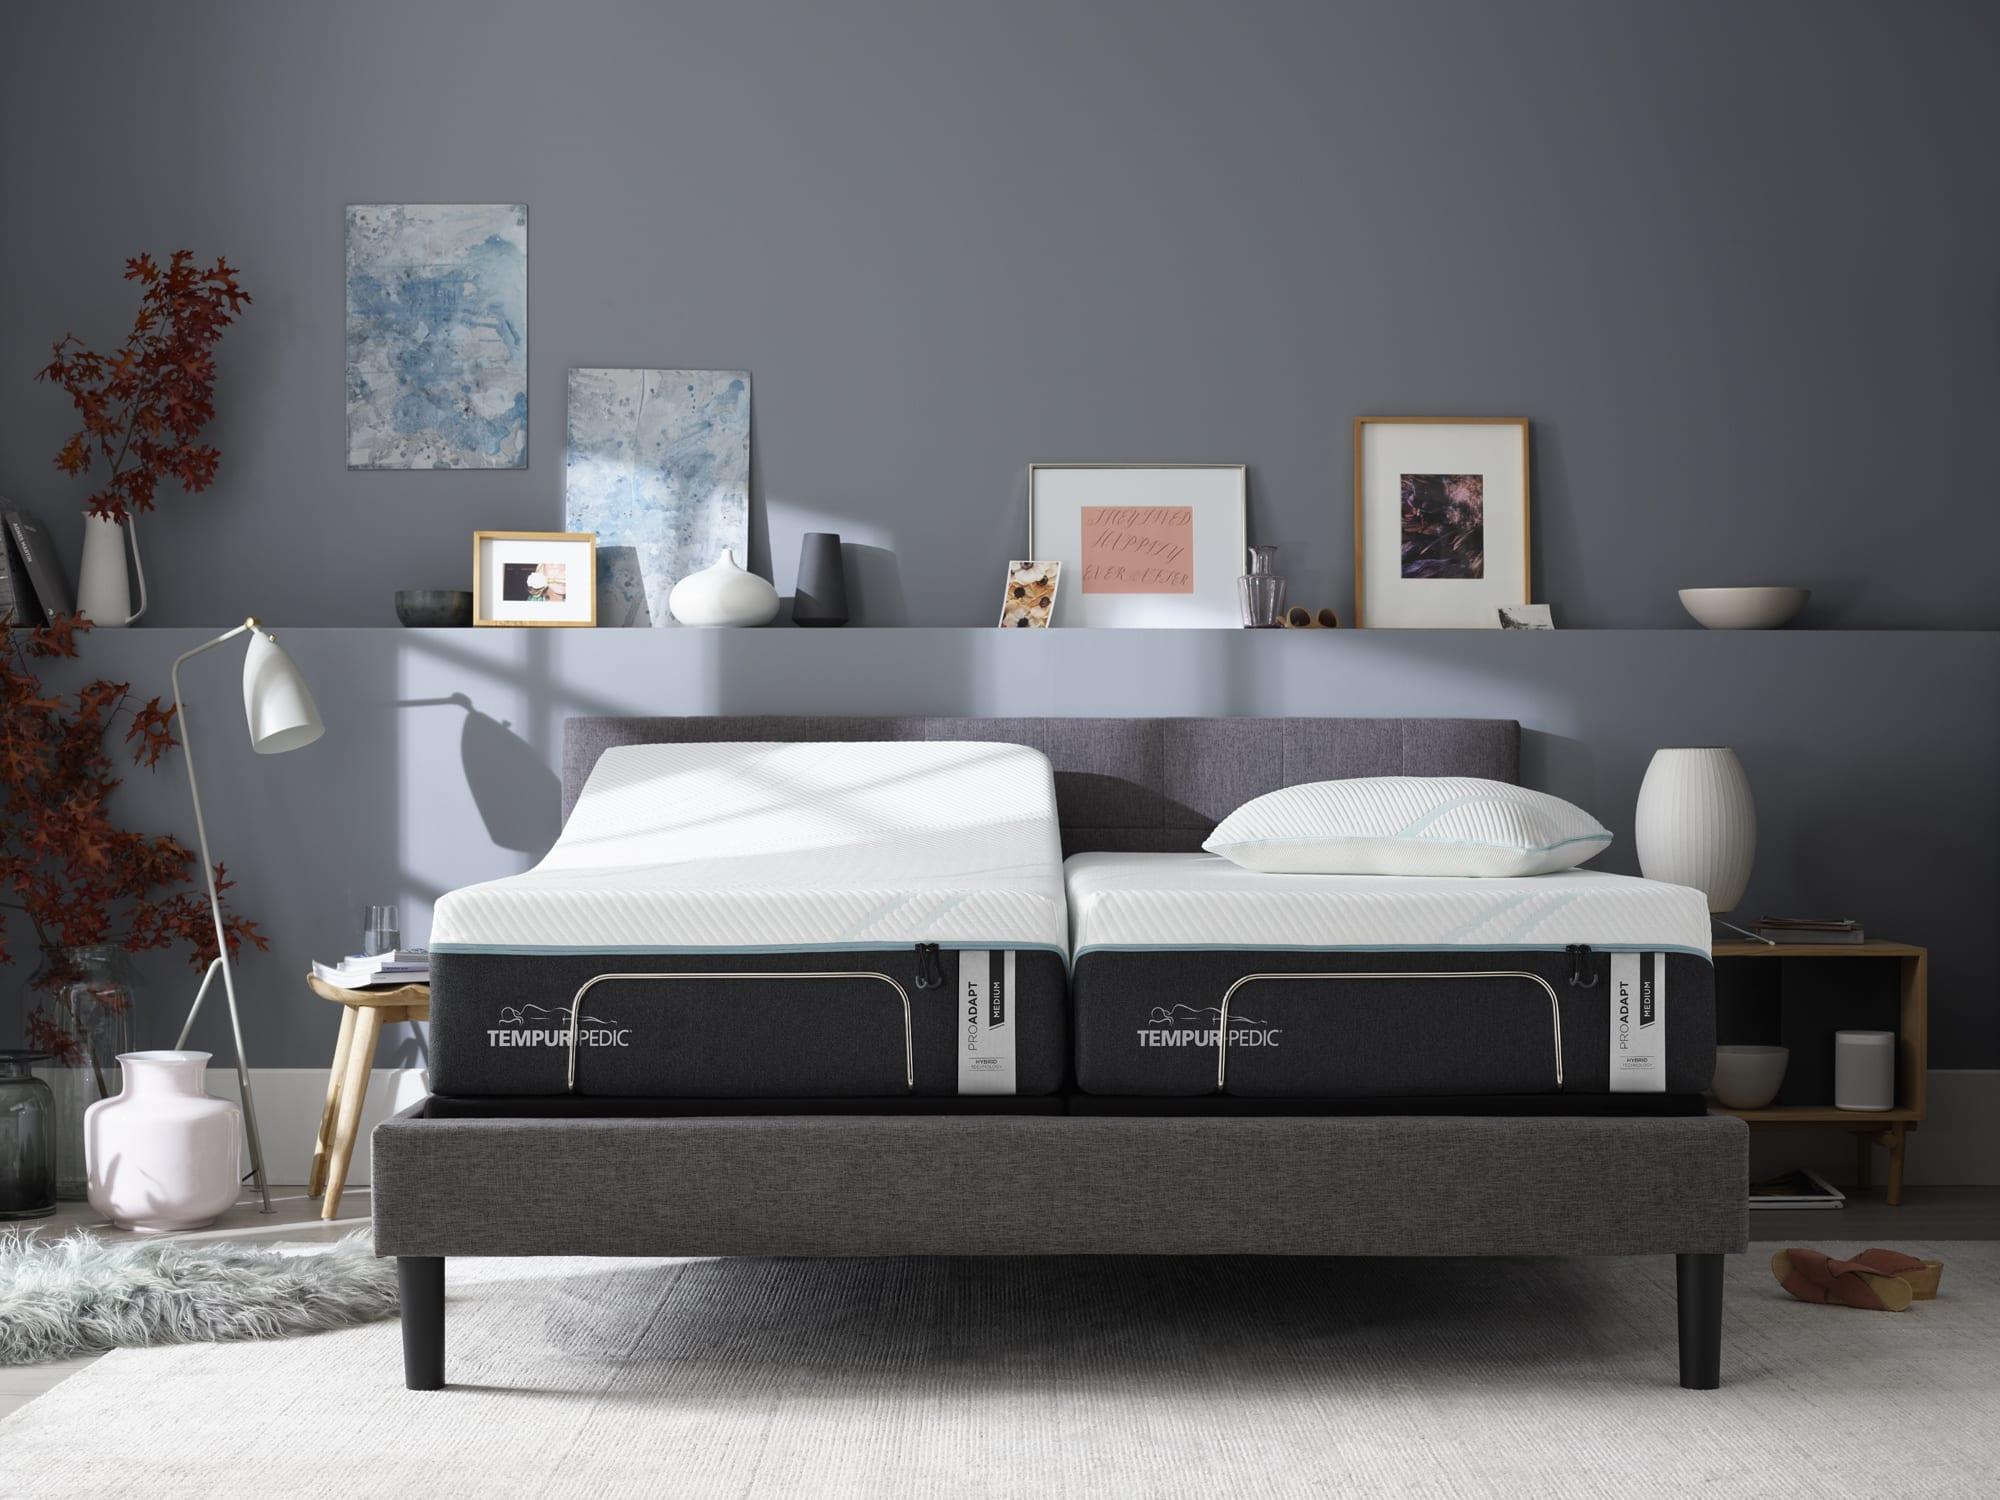 Tempur-Pedic Adjustable bed in a modern bedroom